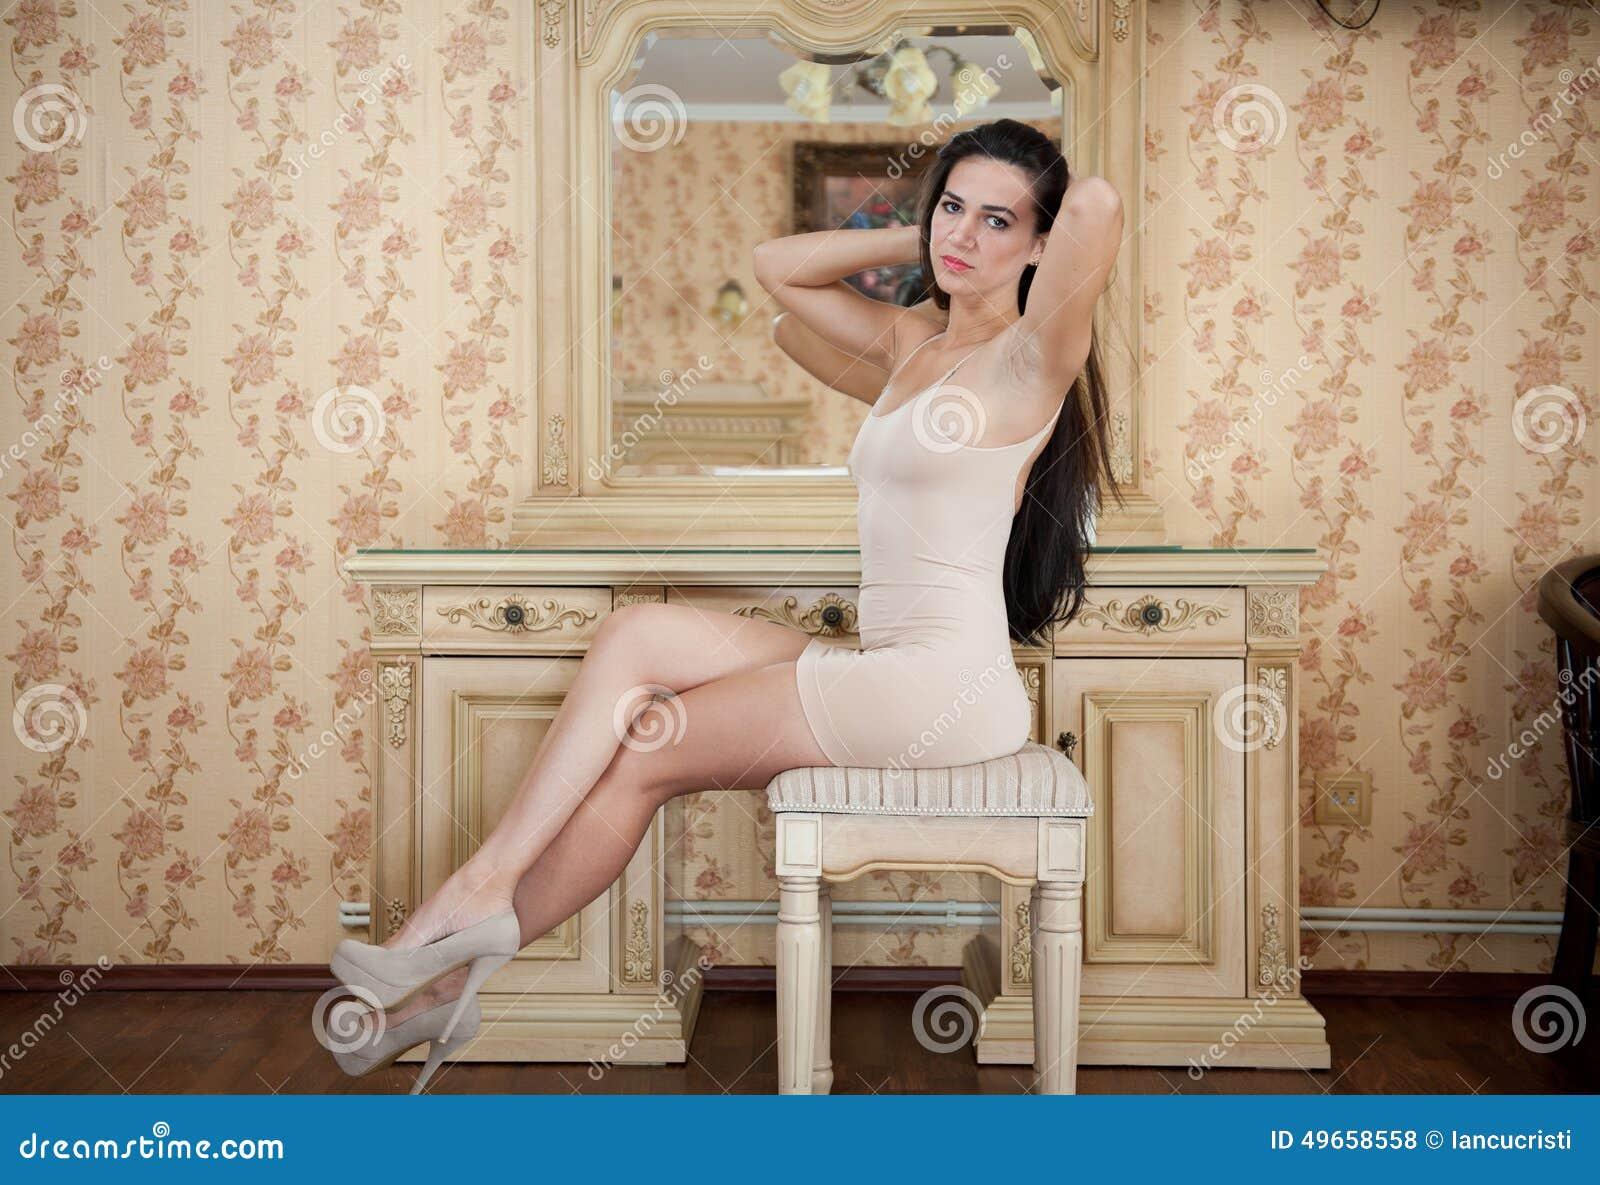 turkish actress girls naked pics